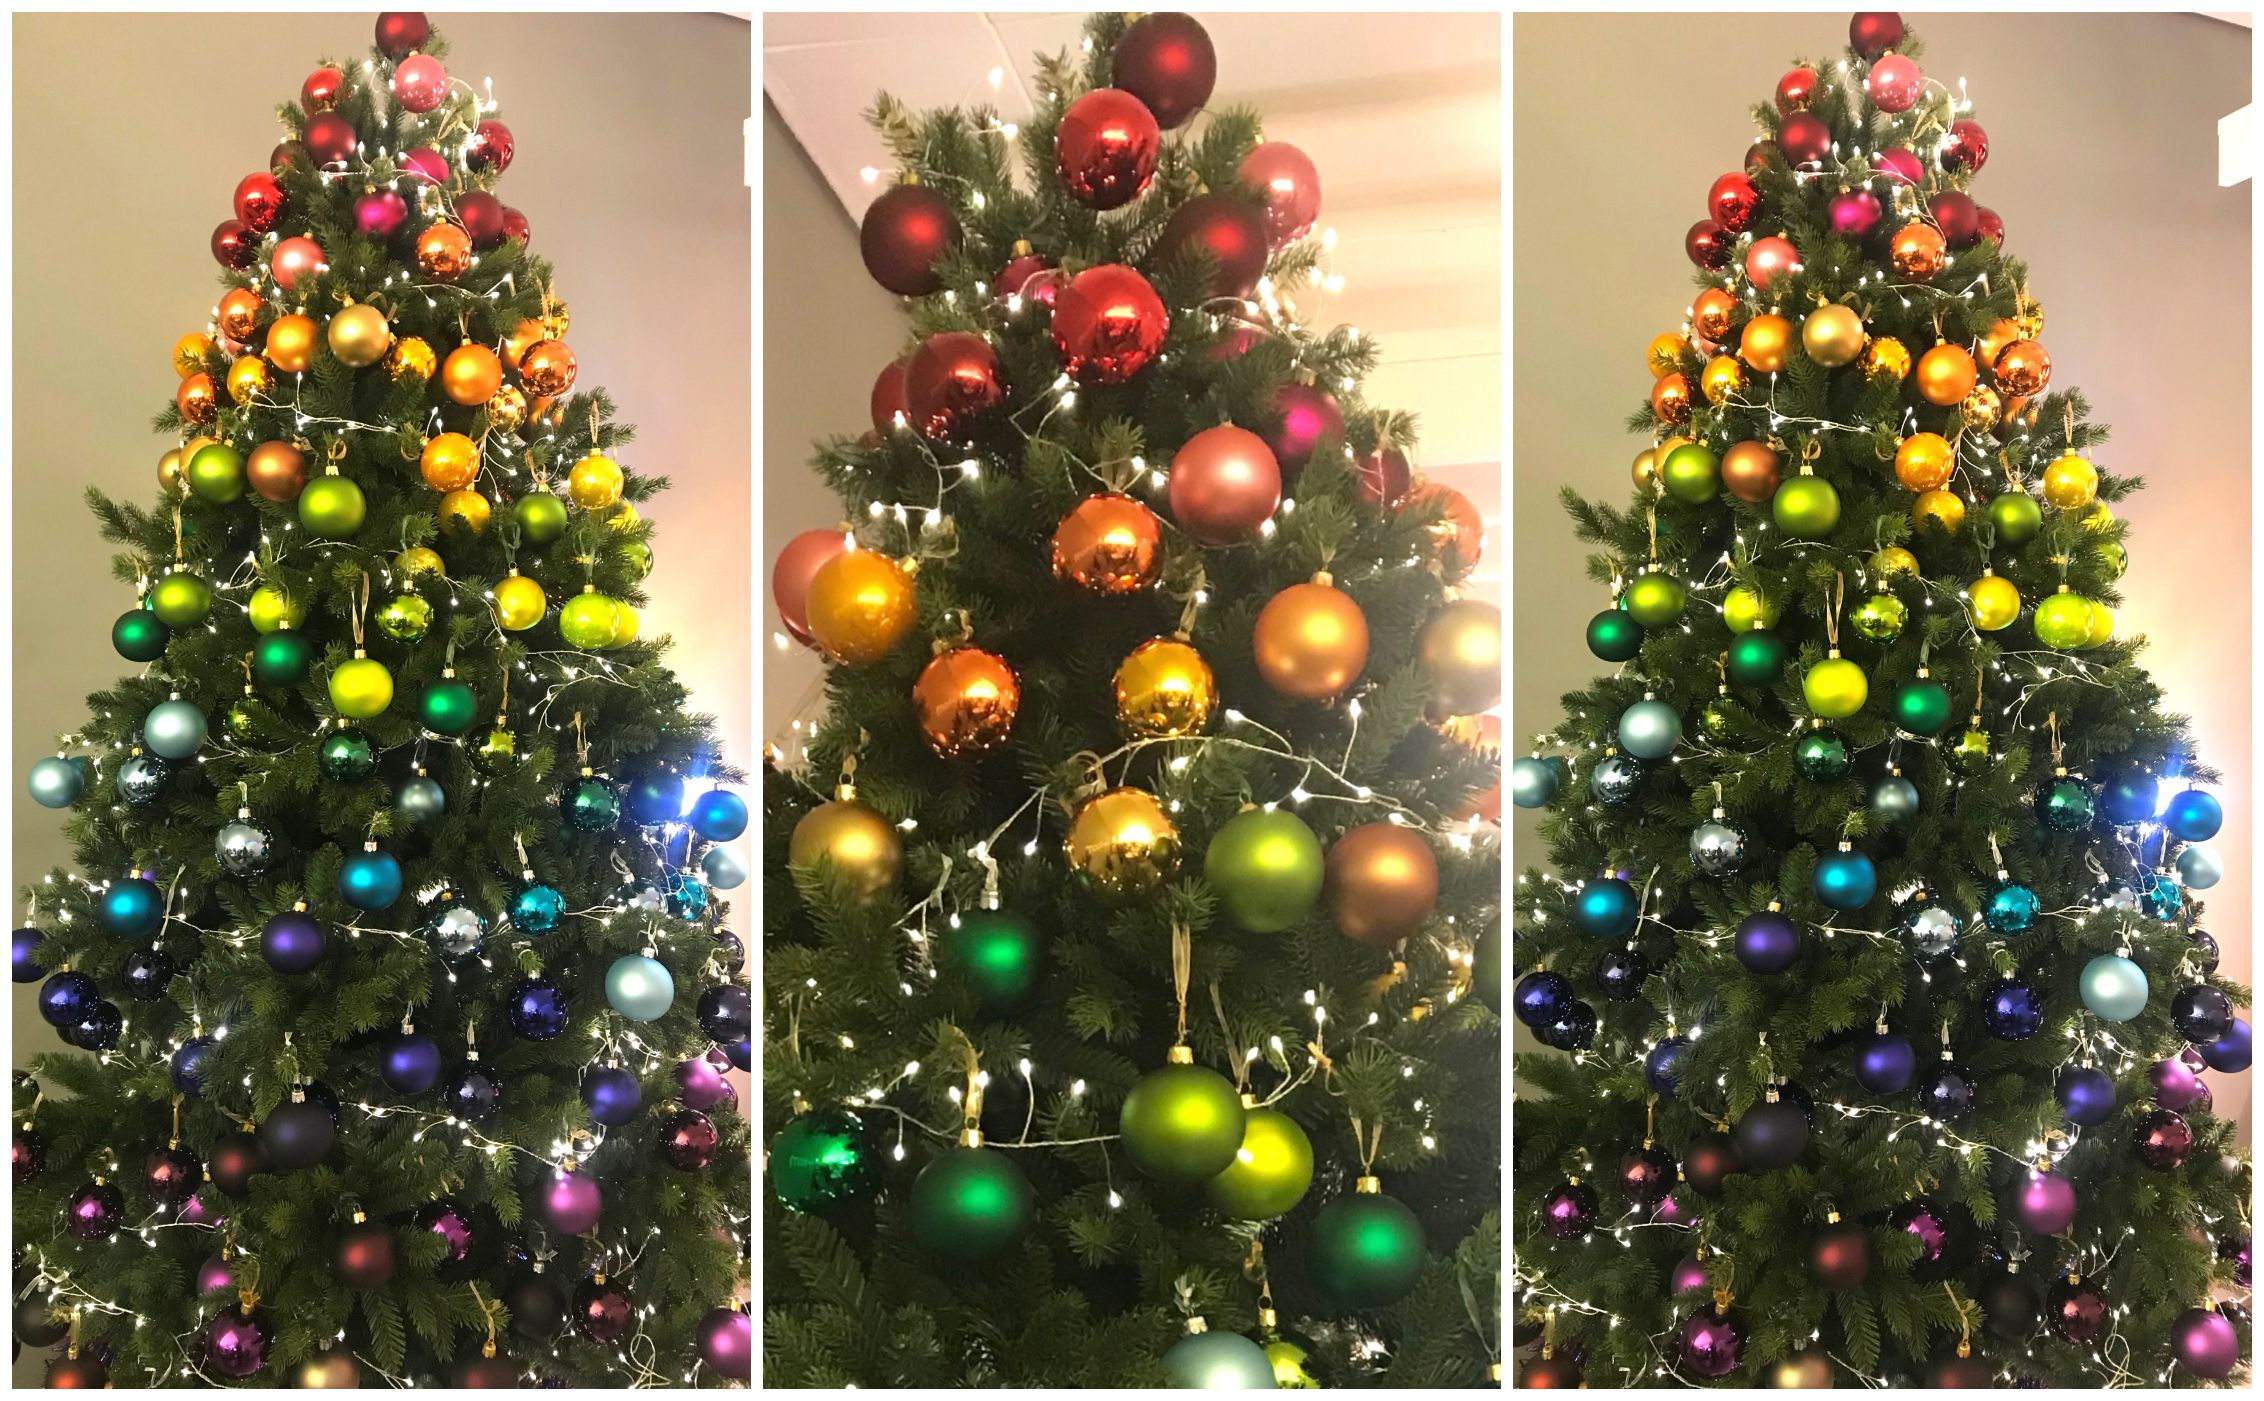 Rainbow Christmas Trees Will Be Biggest Christmas 2018